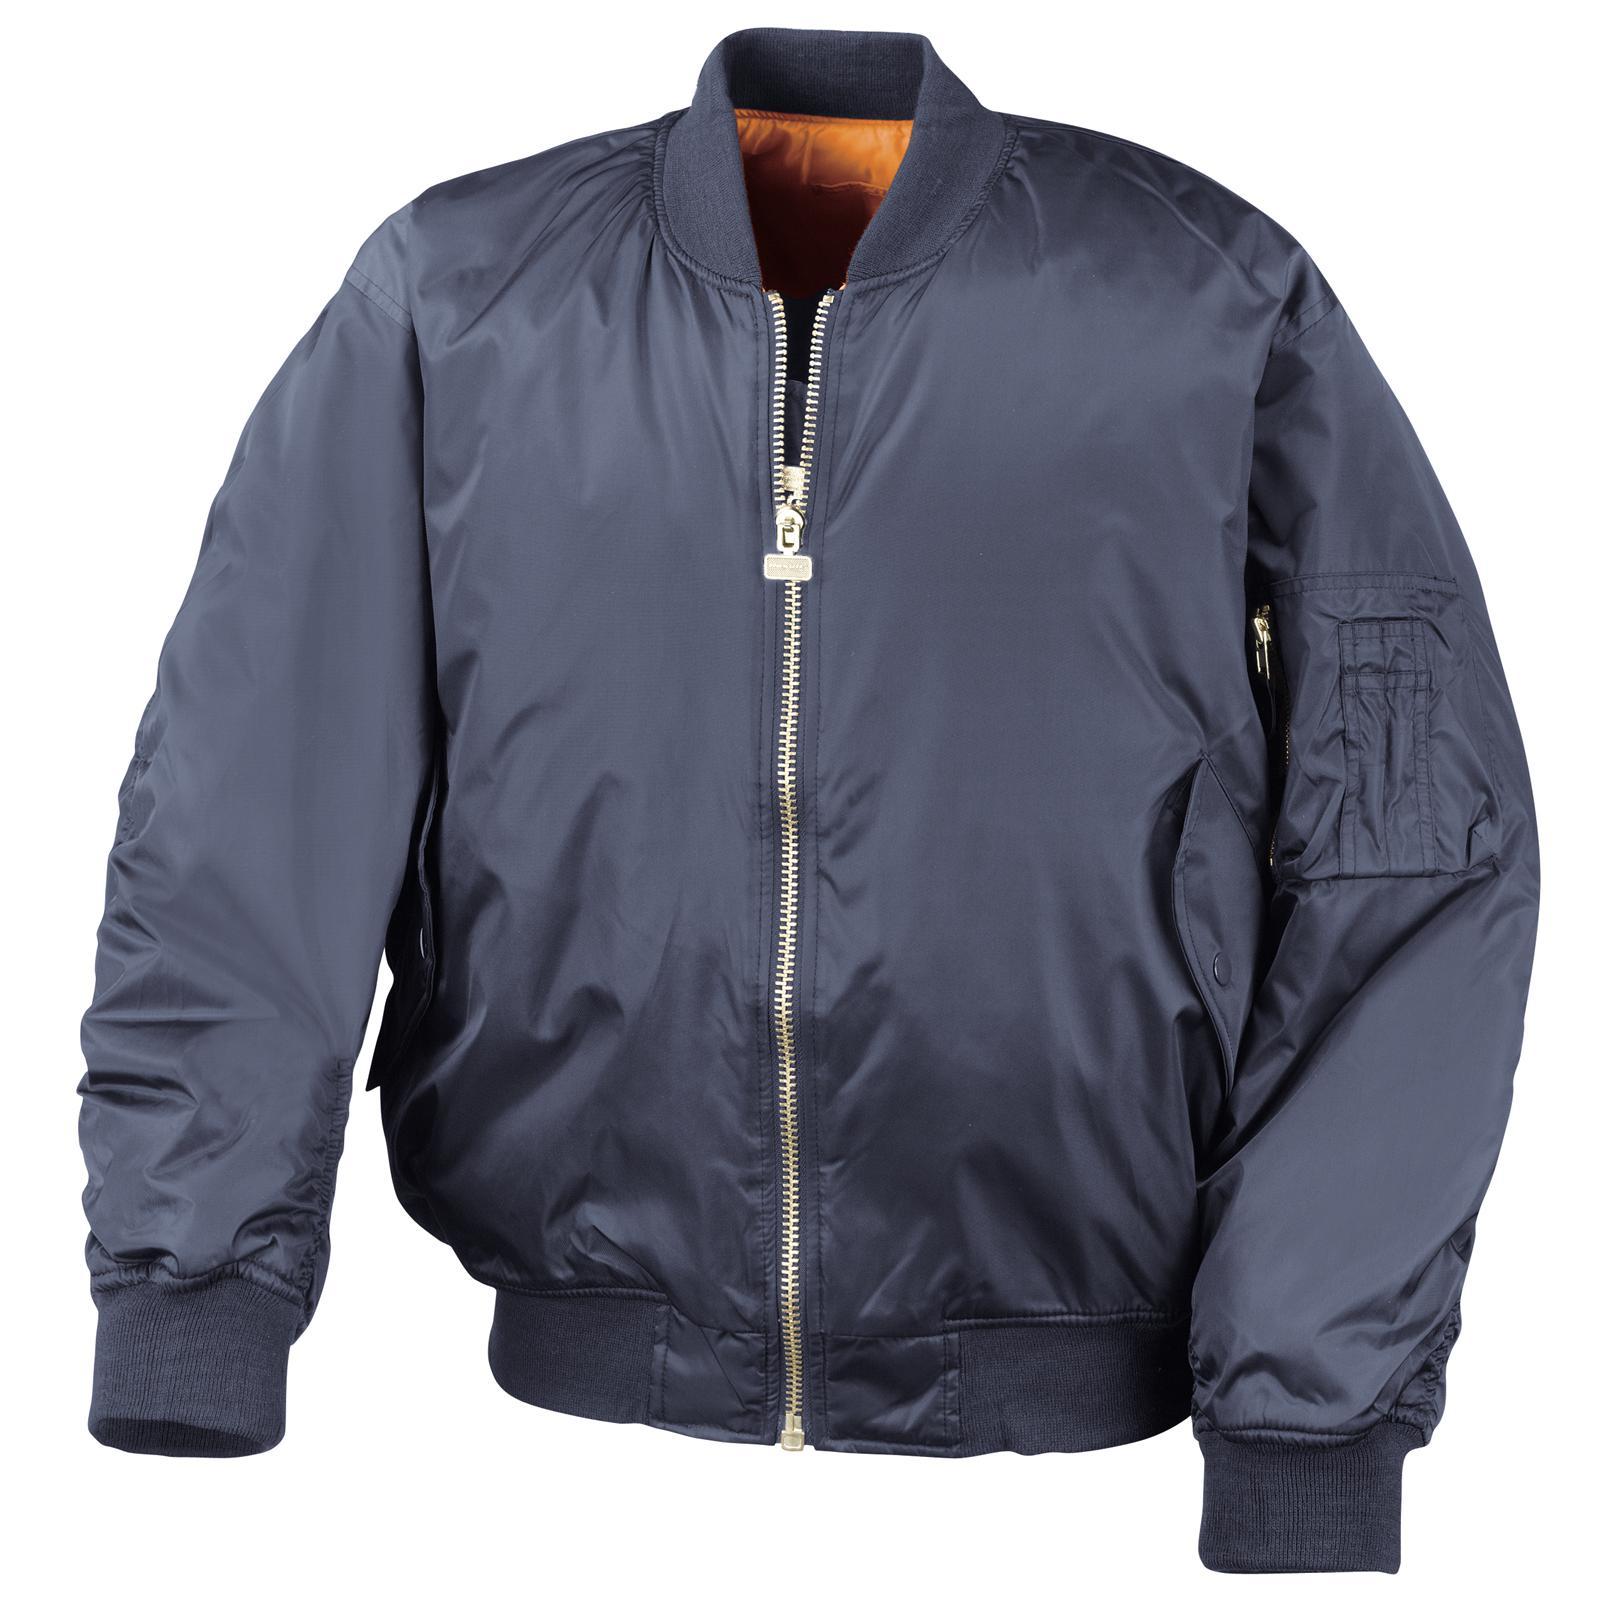 new result mens casual reversible flying bomber jacket in black navy s xxl ebay. Black Bedroom Furniture Sets. Home Design Ideas